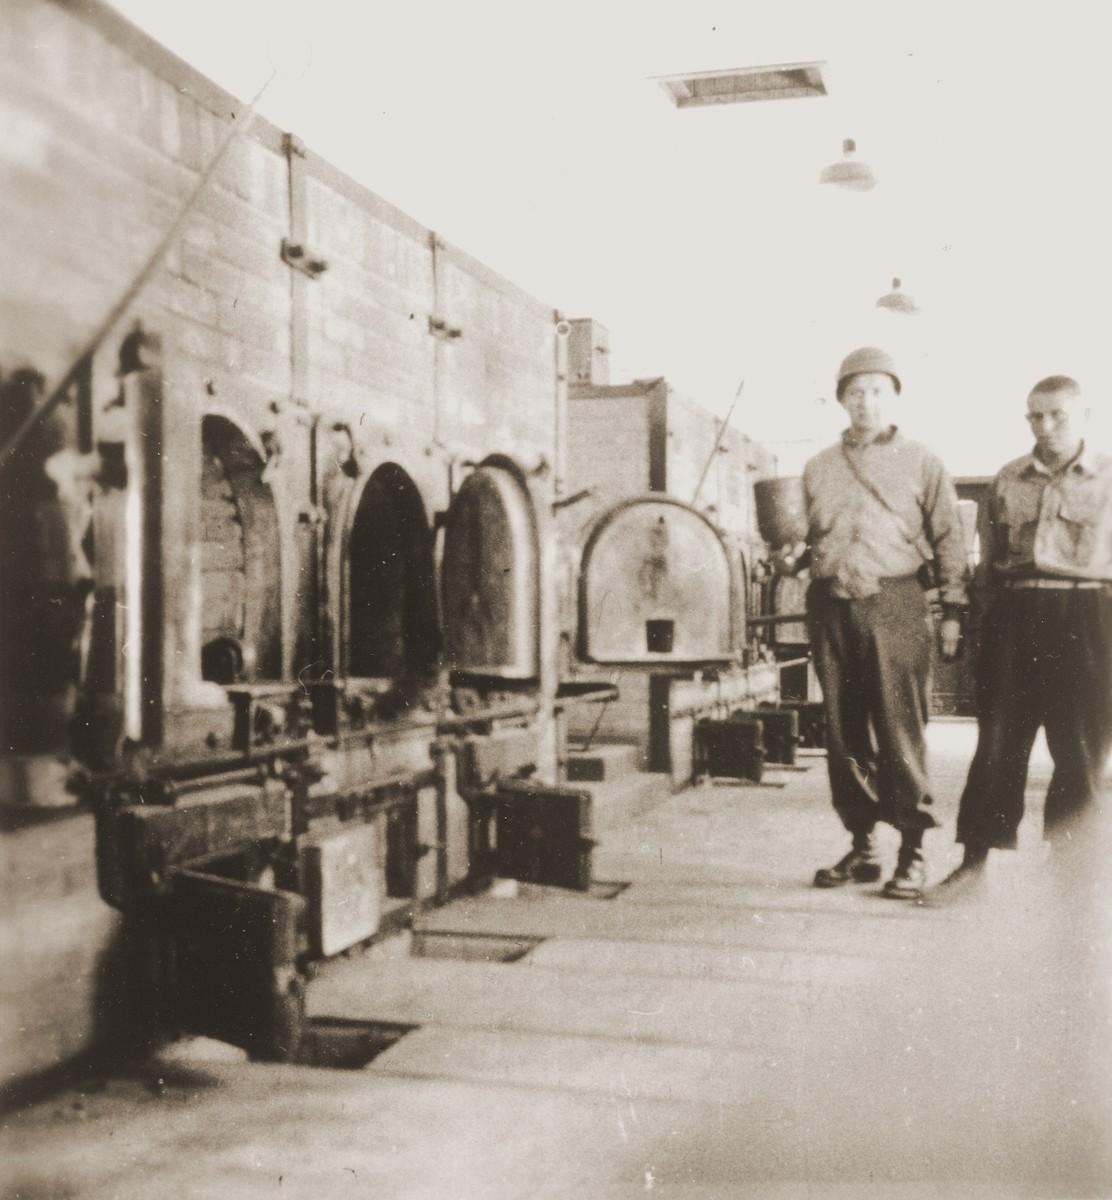 An American soldier inspects the crematorium in Buchenwald.